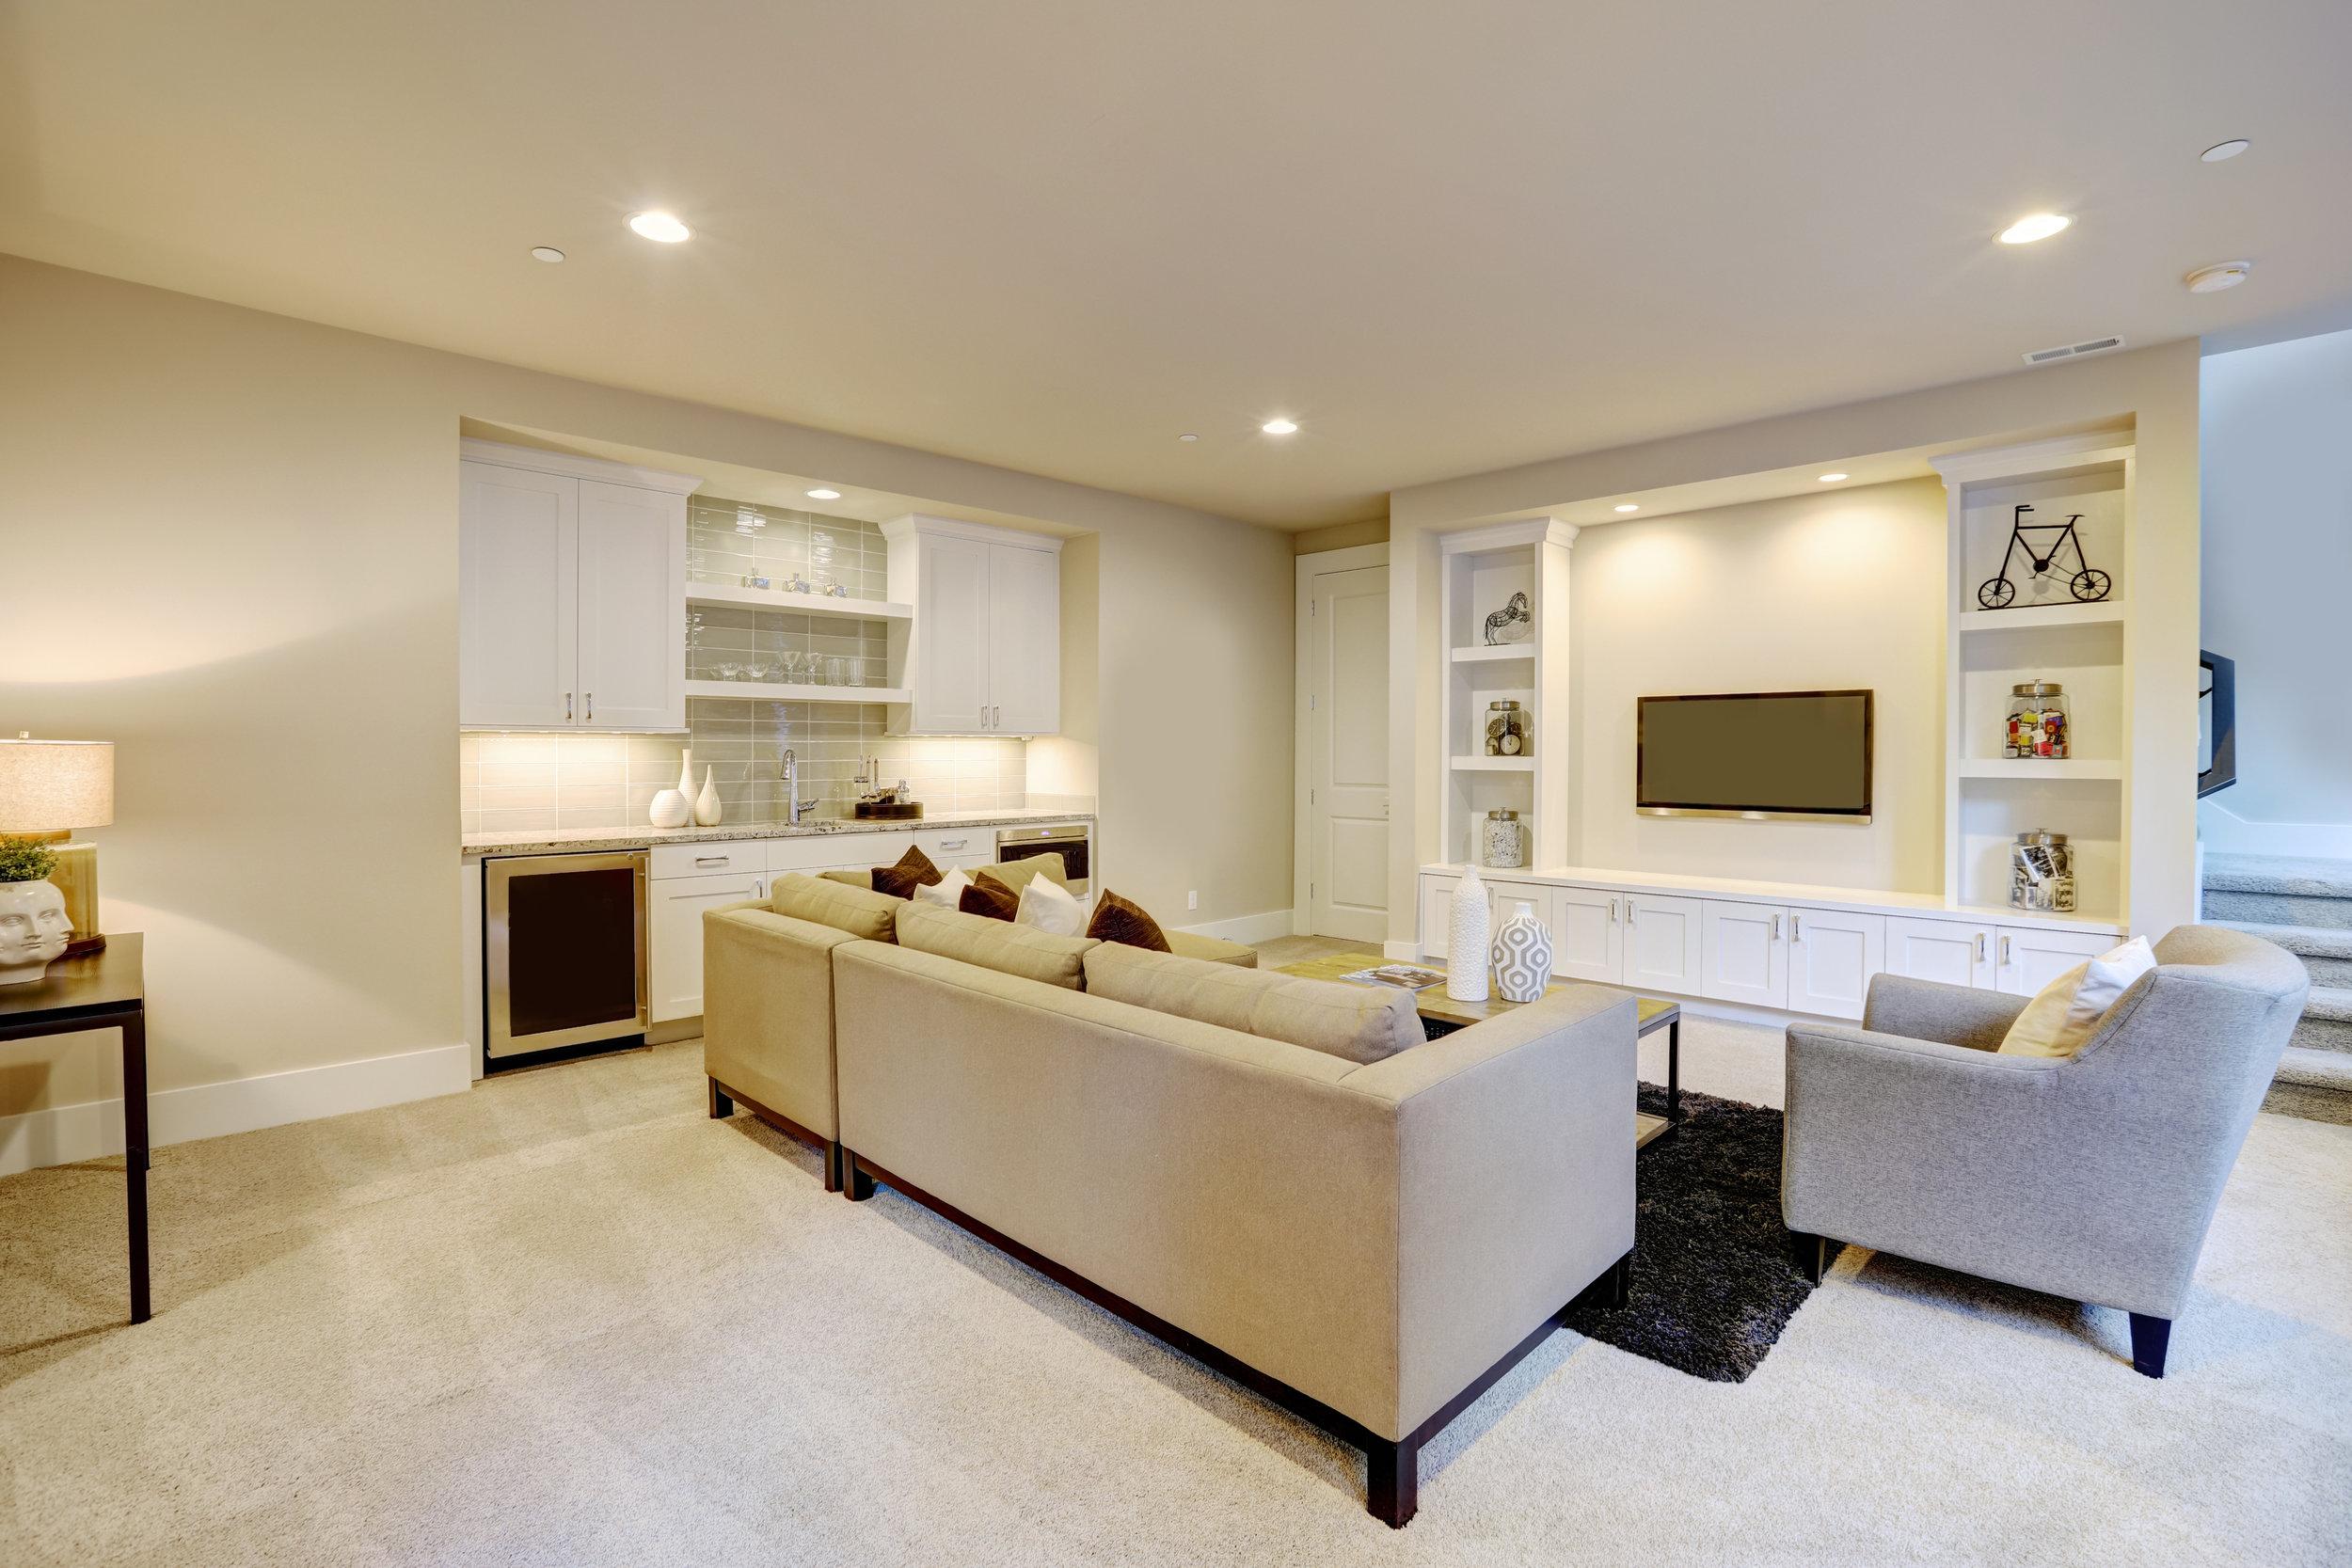 Maloney Interiors Residential Interior Designer Barrington Rhode Island.jpeg